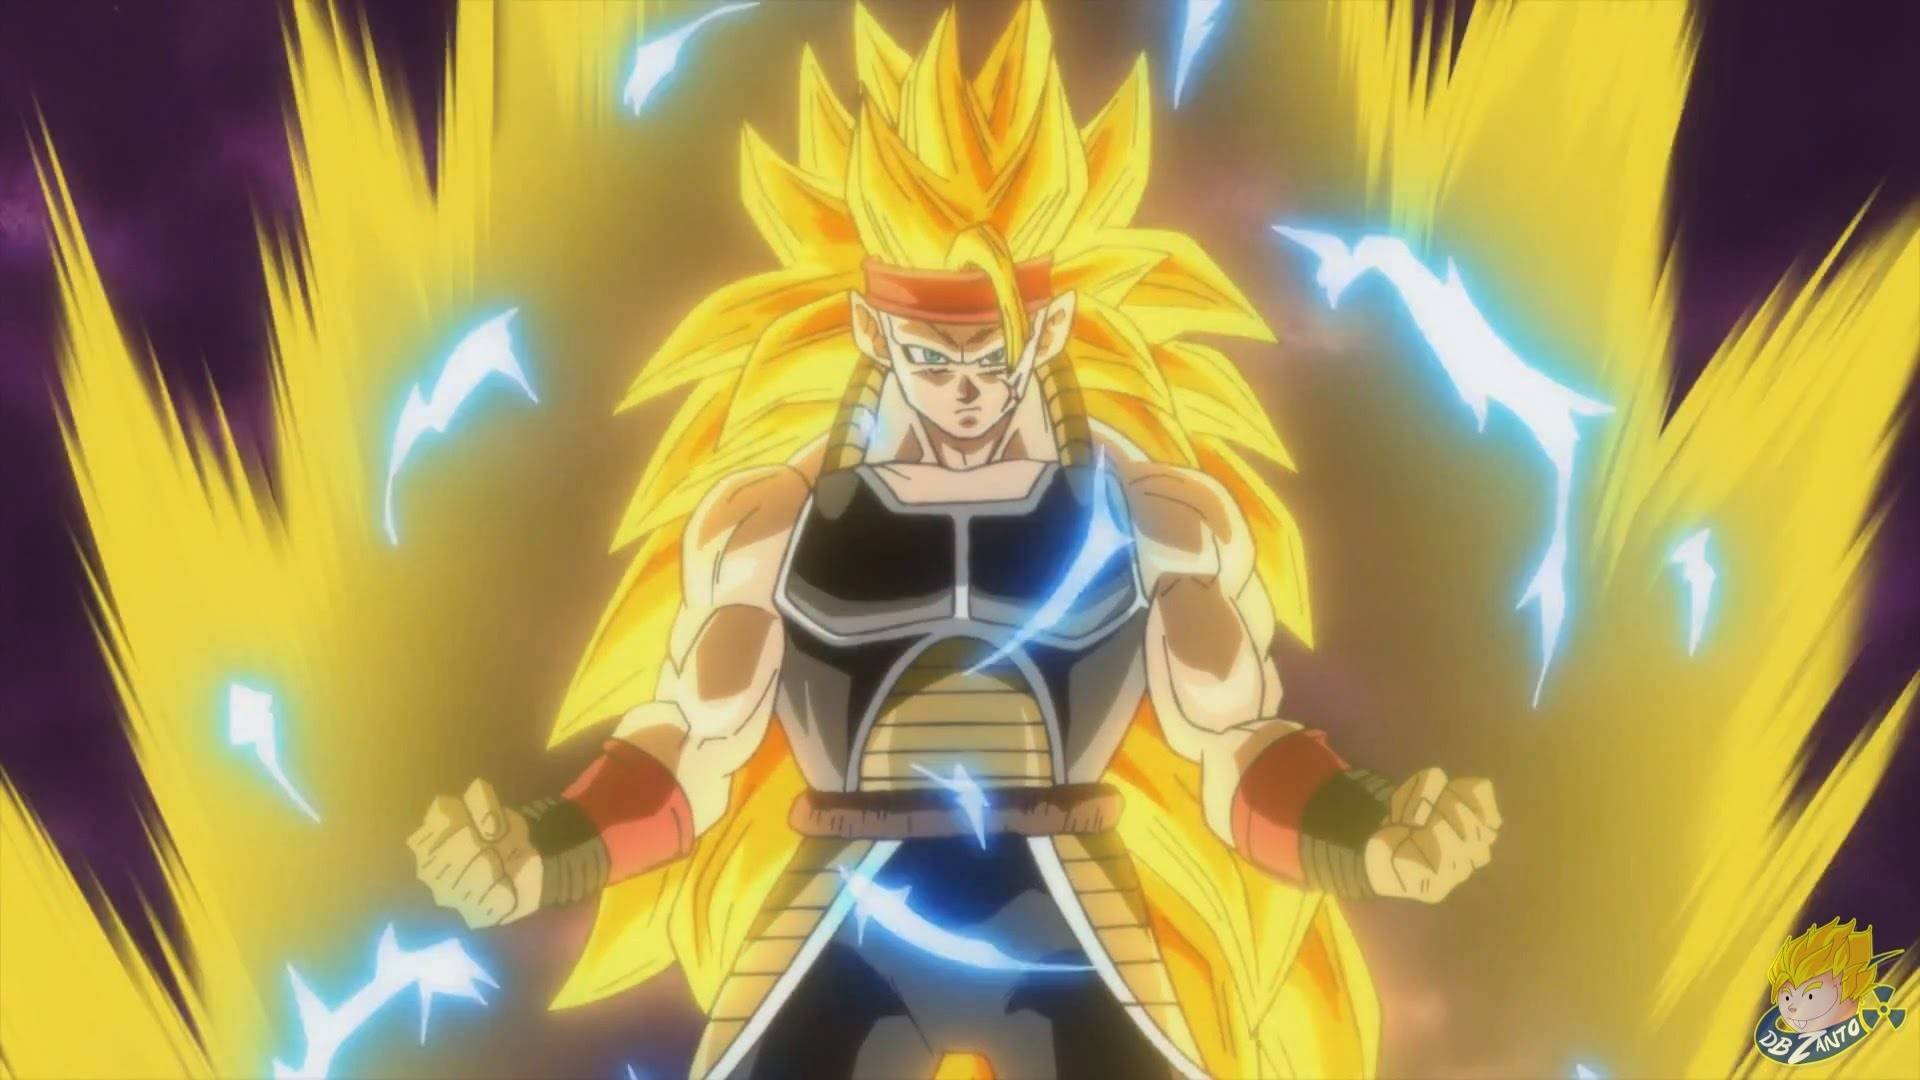 Goku Live Wallpaper Iphone X Dragon Ball Z Bardock Wallpaper 76 Images